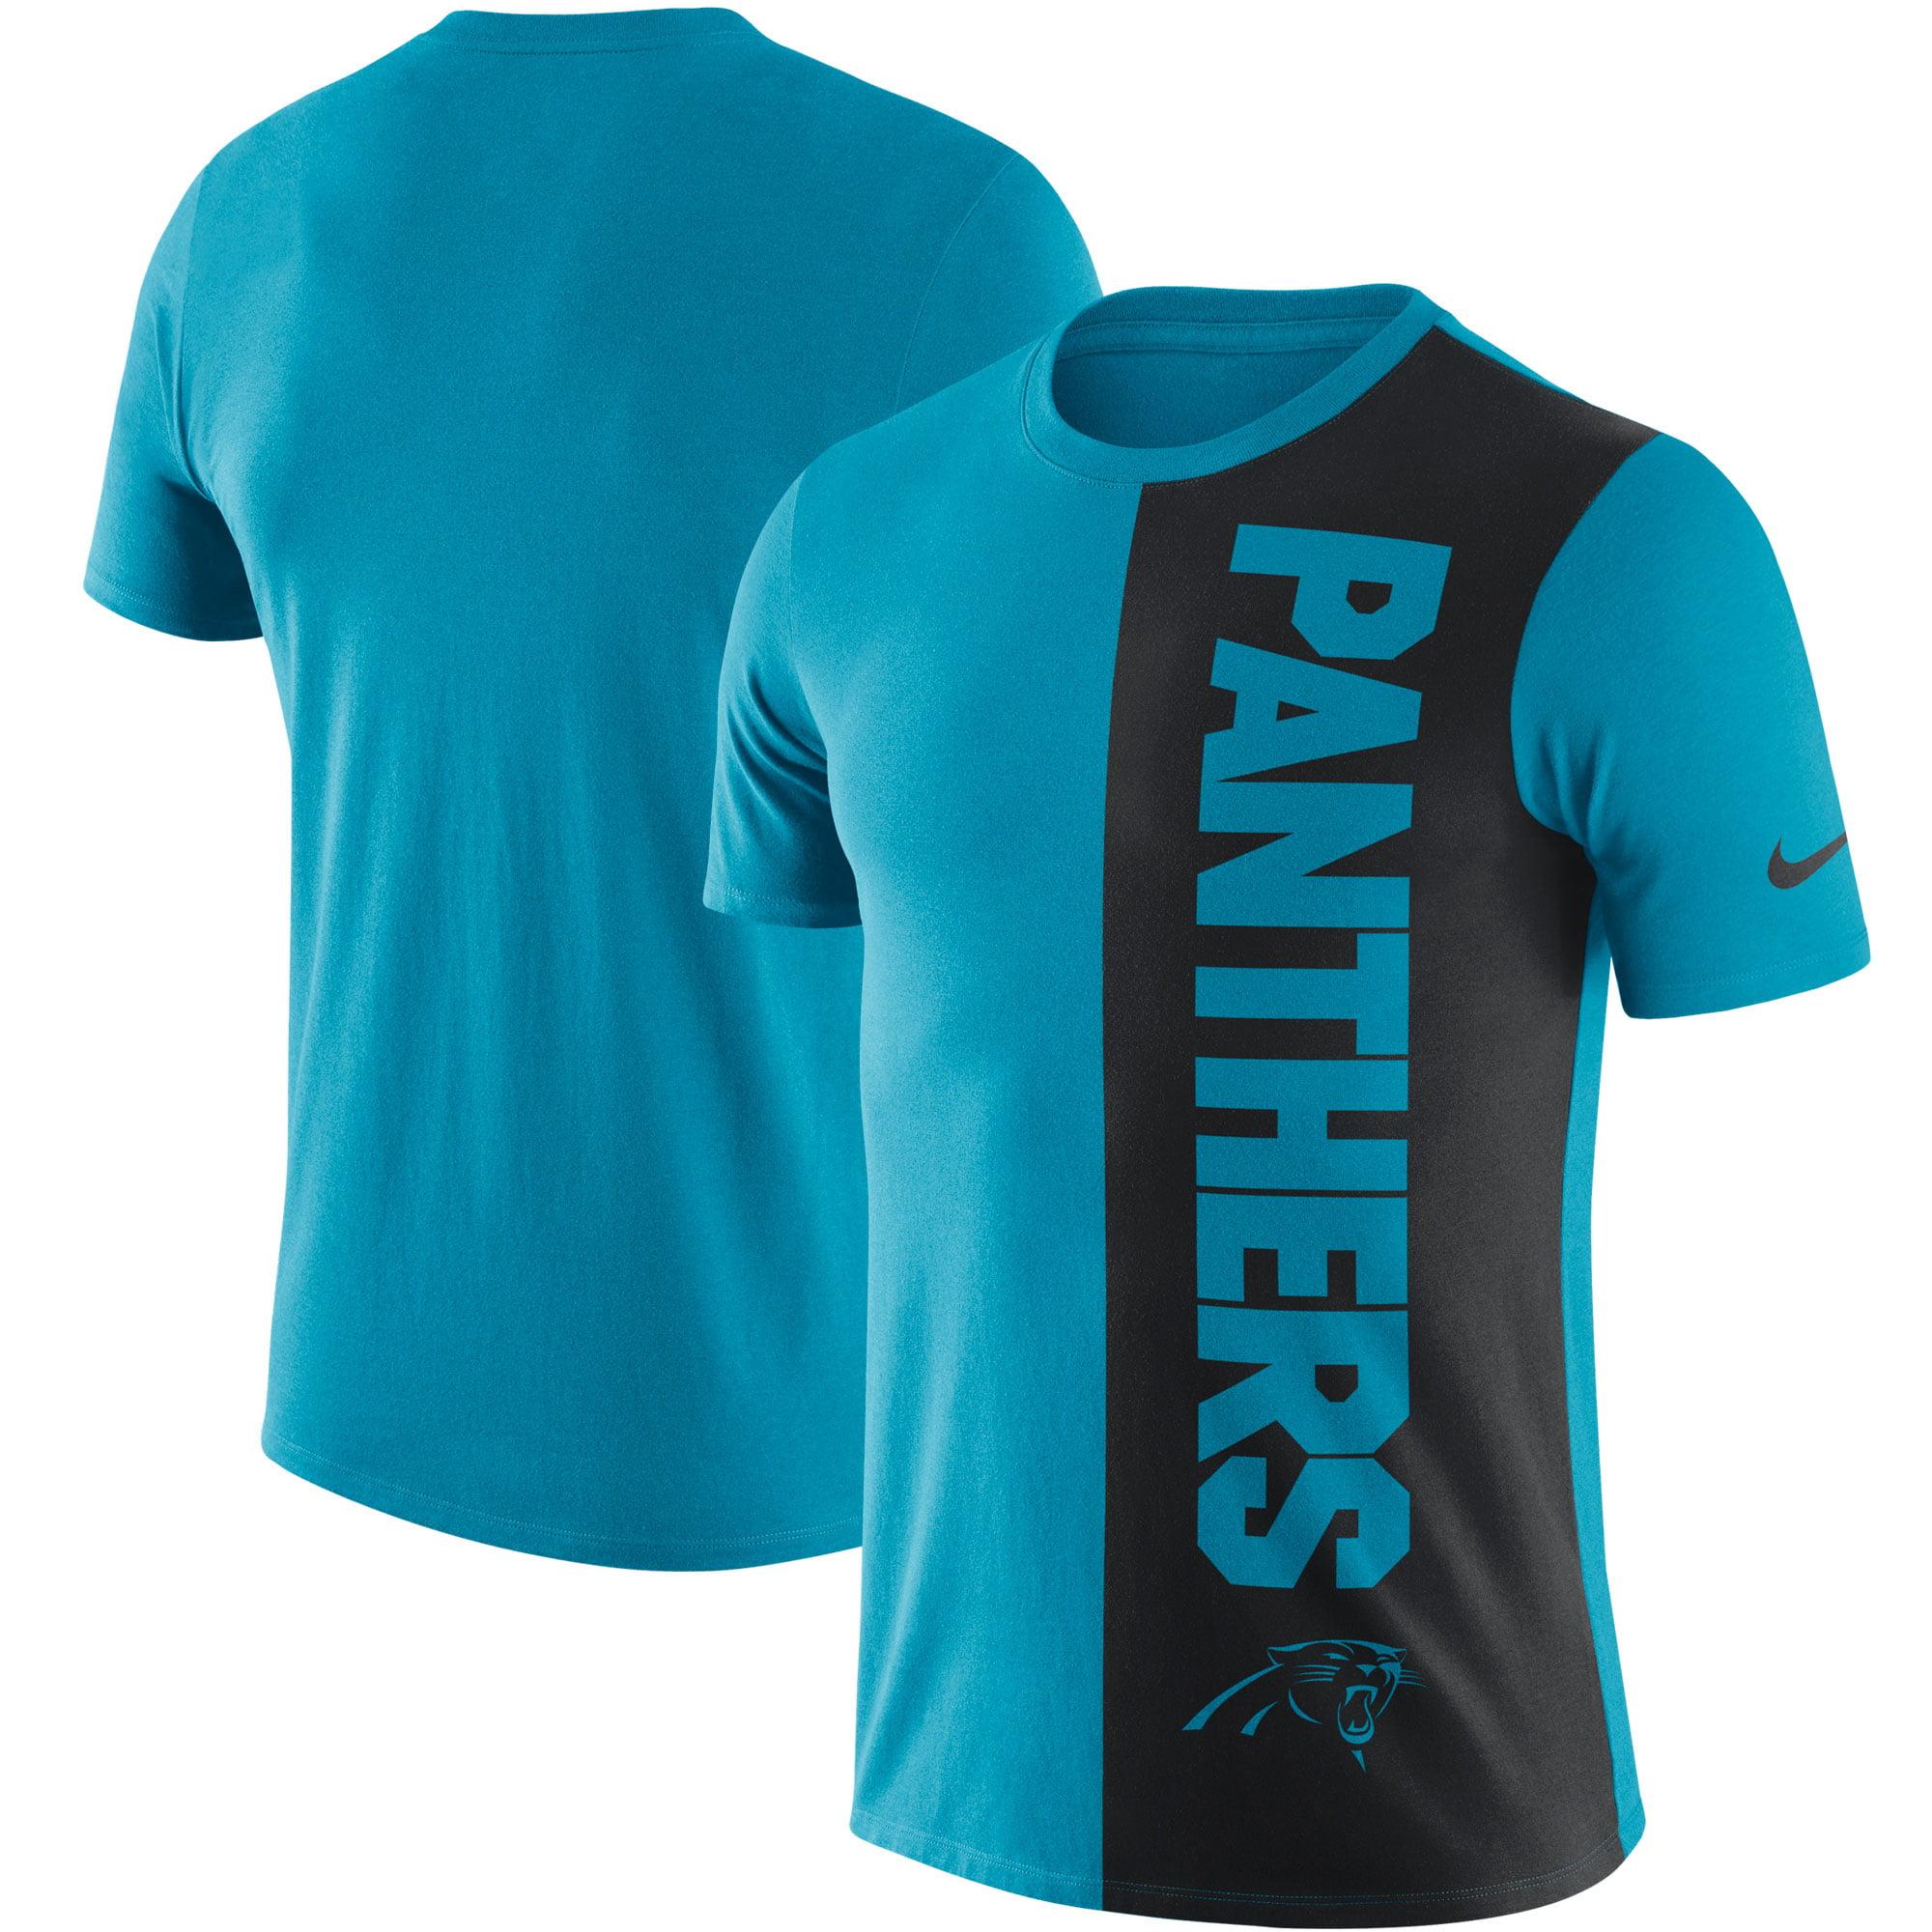 Carolina Panthers Nike Coin Flip Tri-Blend T-Shirt - Blue/Black